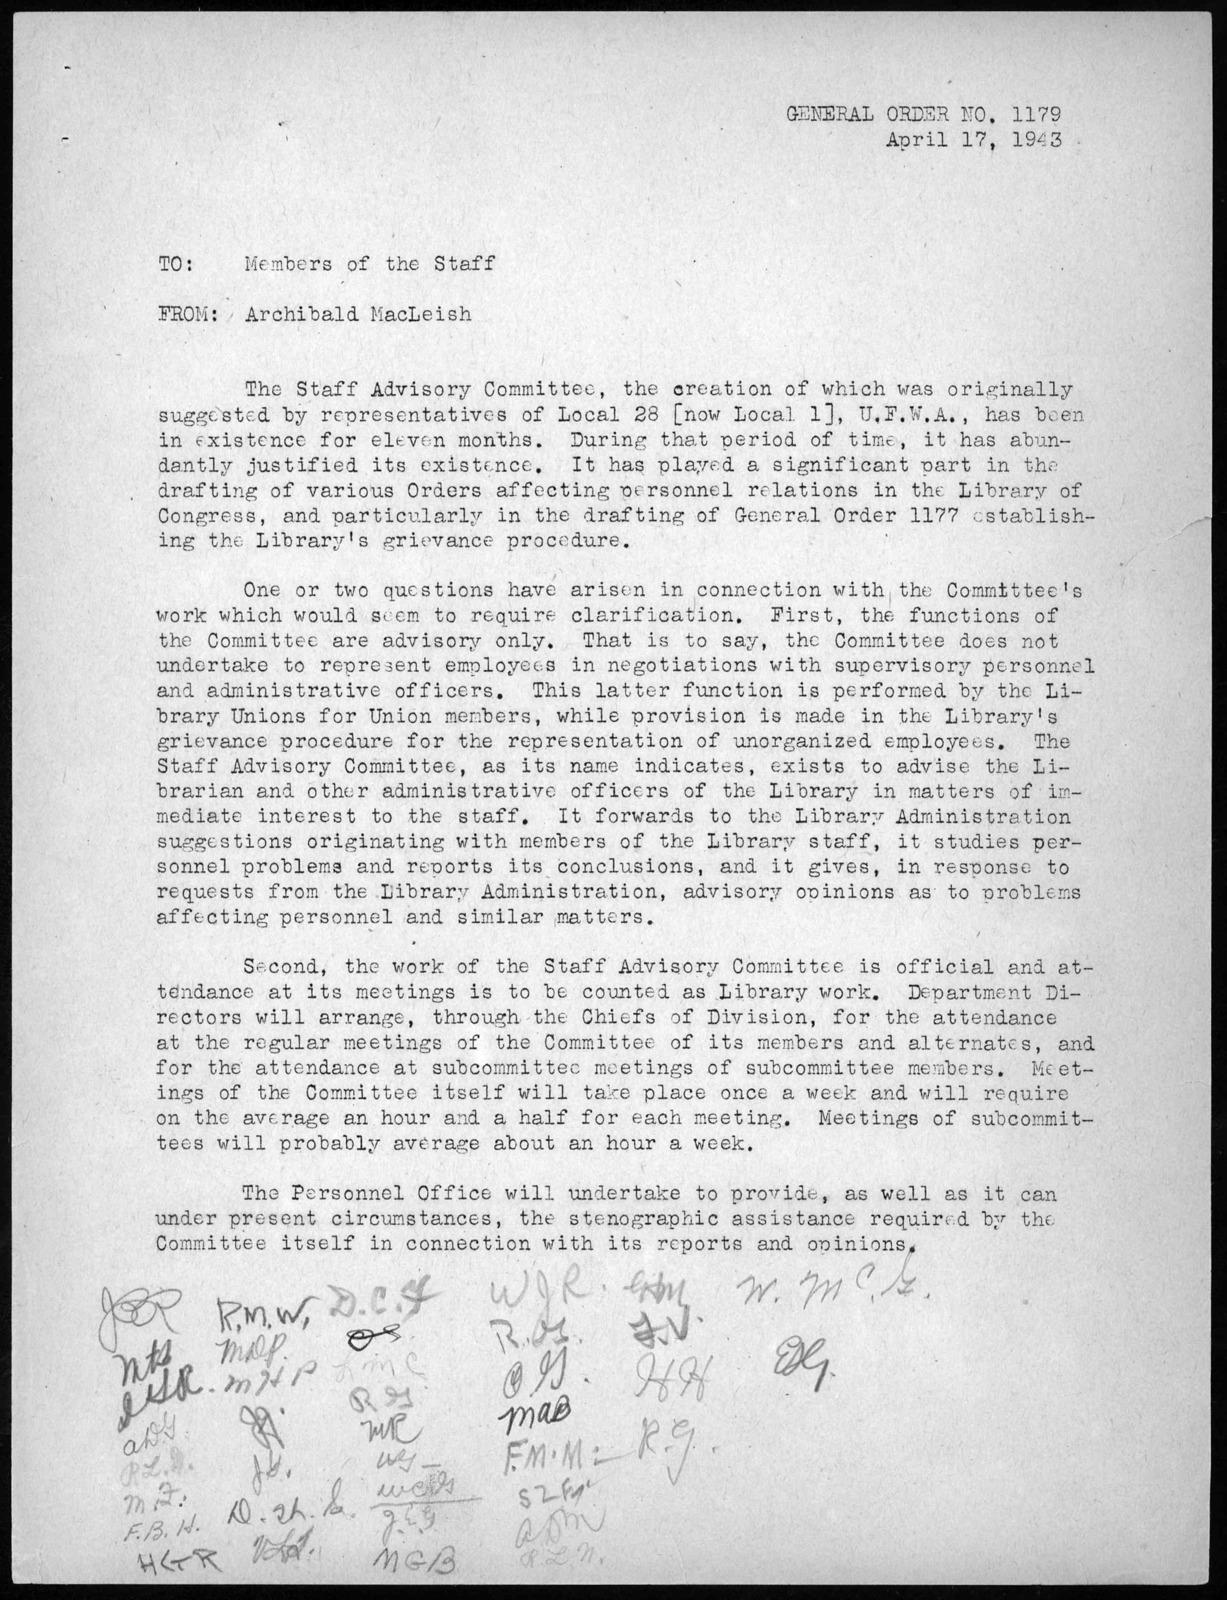 General Order No. 1179, Library of Congress, April 17, 1943